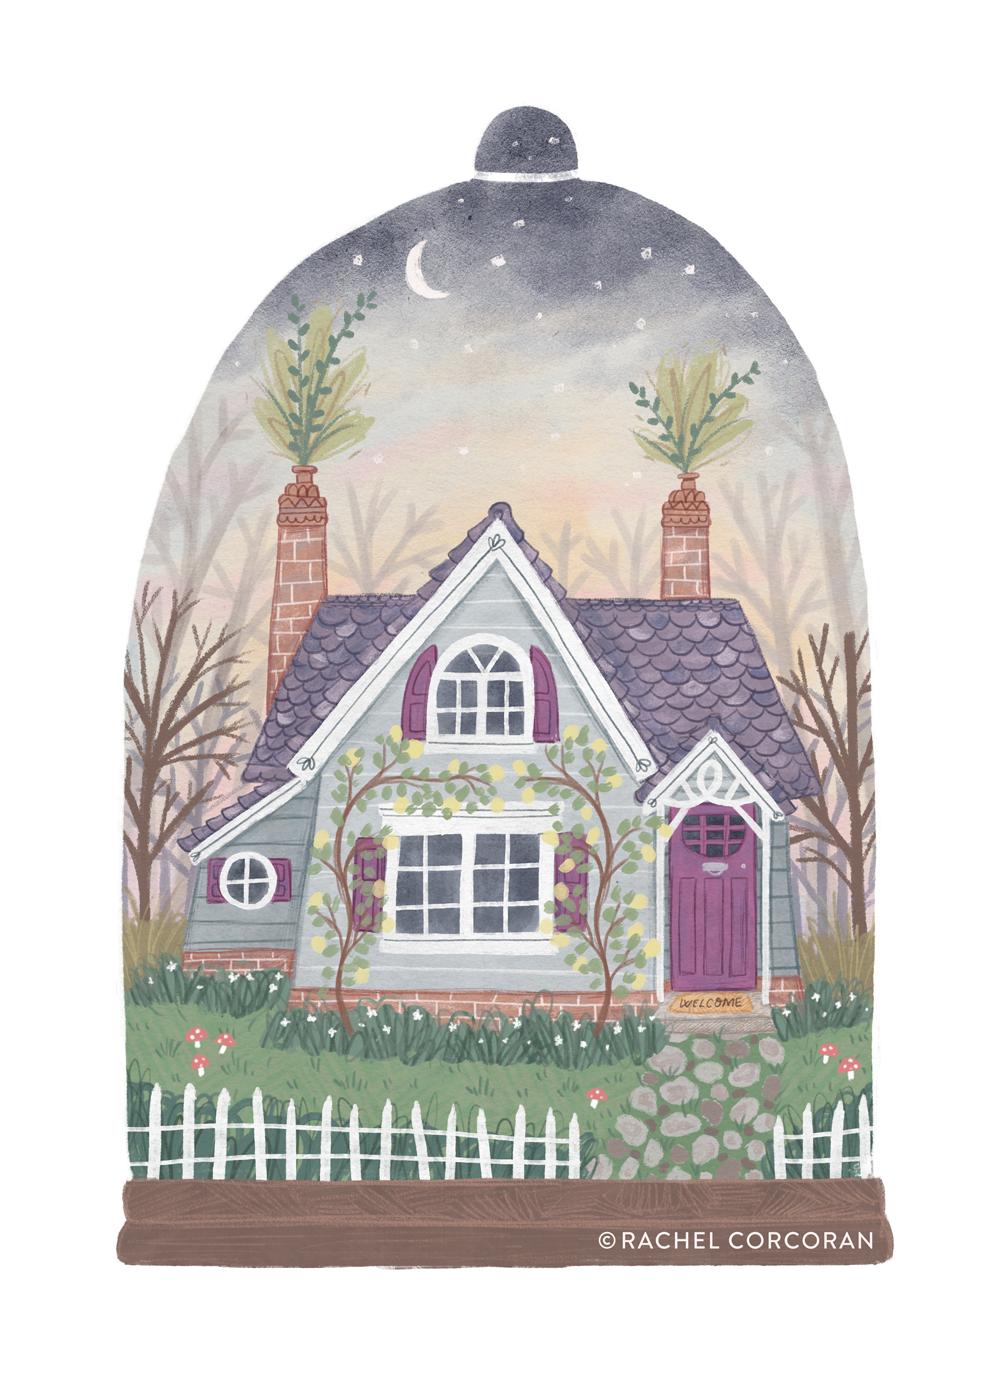 Tiny house edwardian cottage illustration by Rachel Corcoran